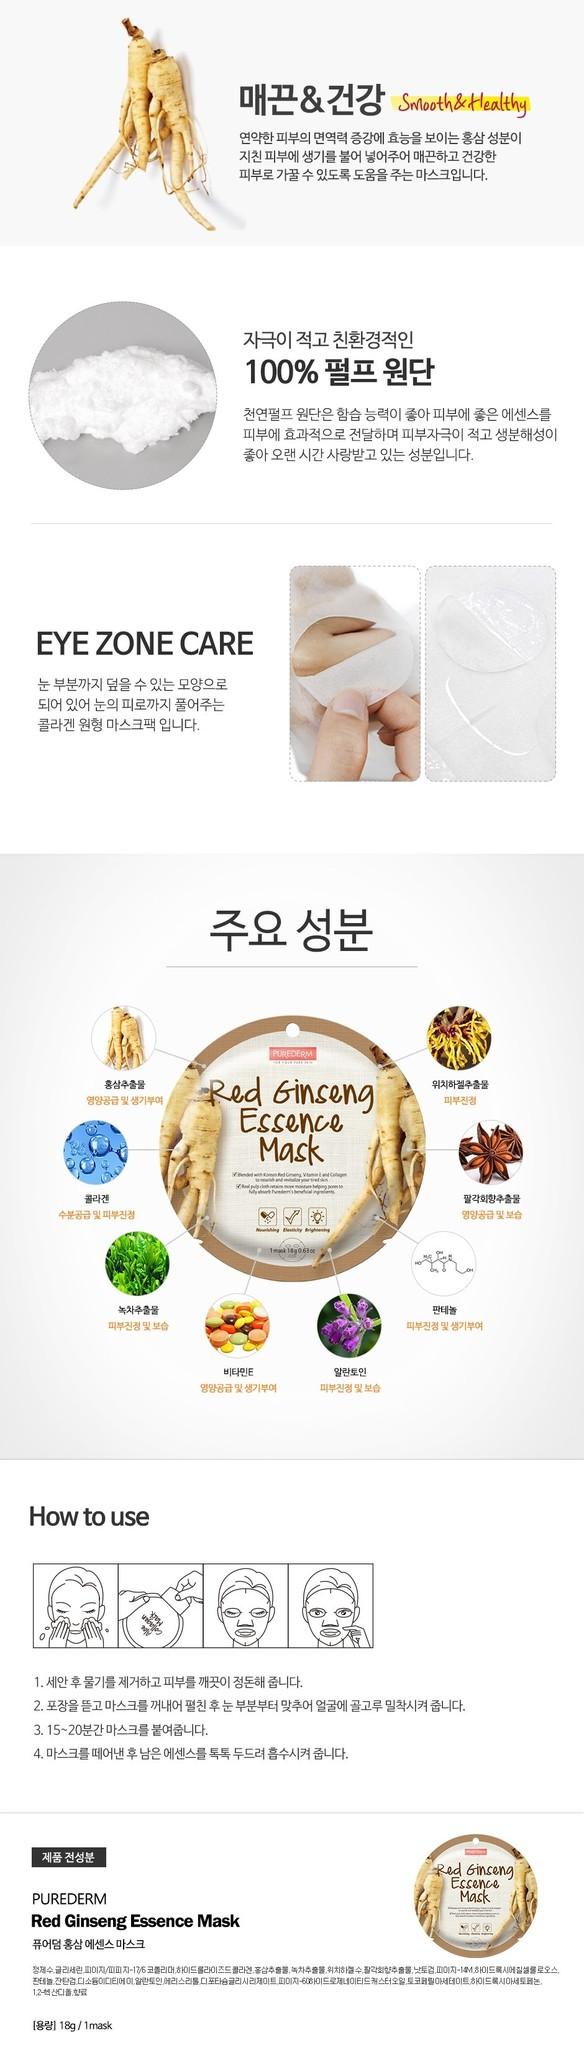 Circle Mask - Red Ginseng Essence-3